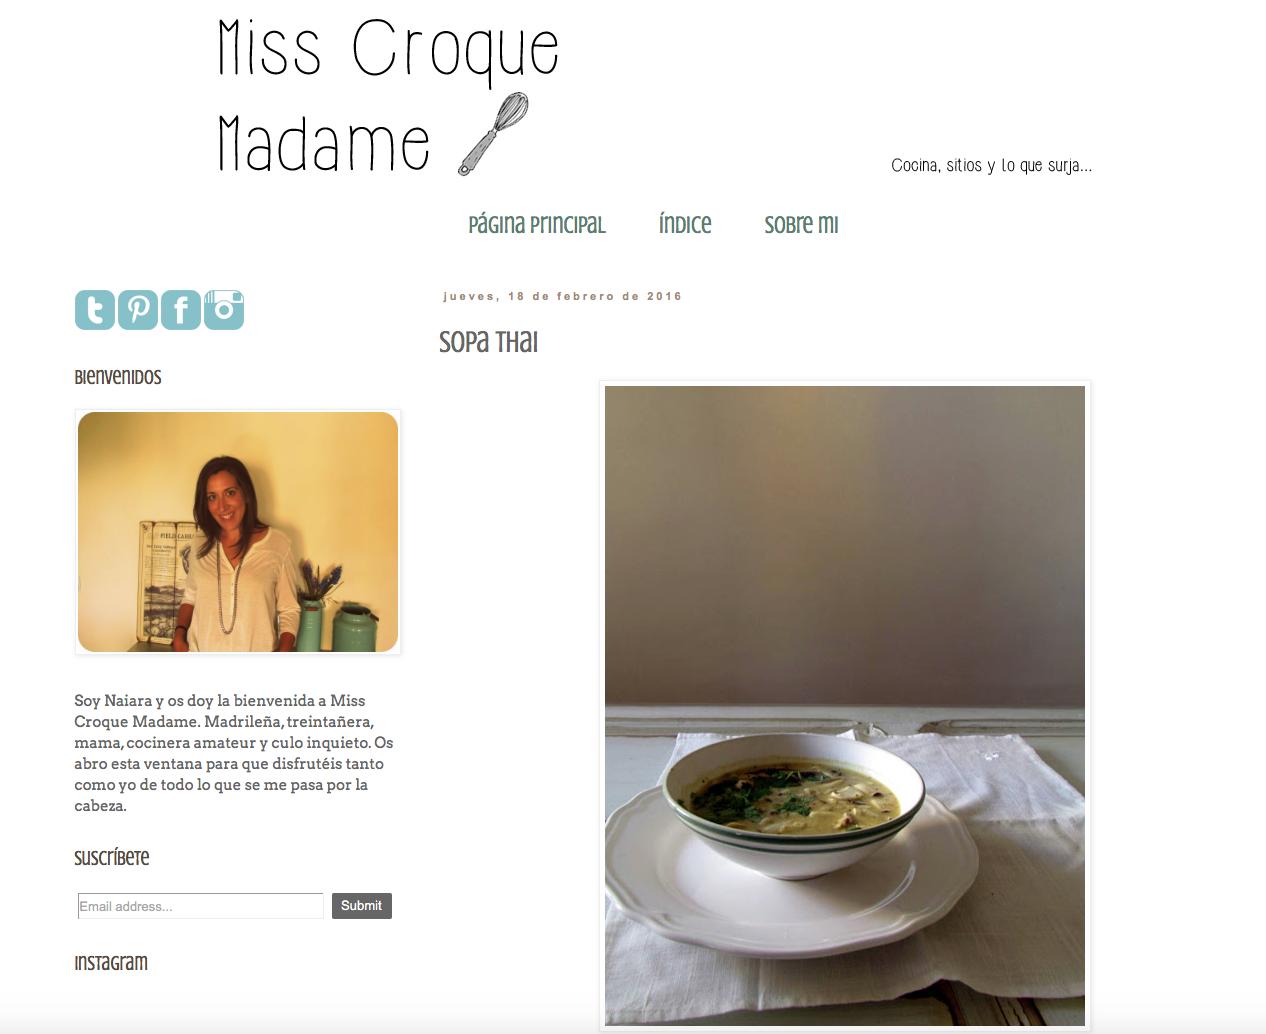 miss croquet madame, blog, cocina, recetas, persistencia o cambio, mar vidal, blogs que seguir